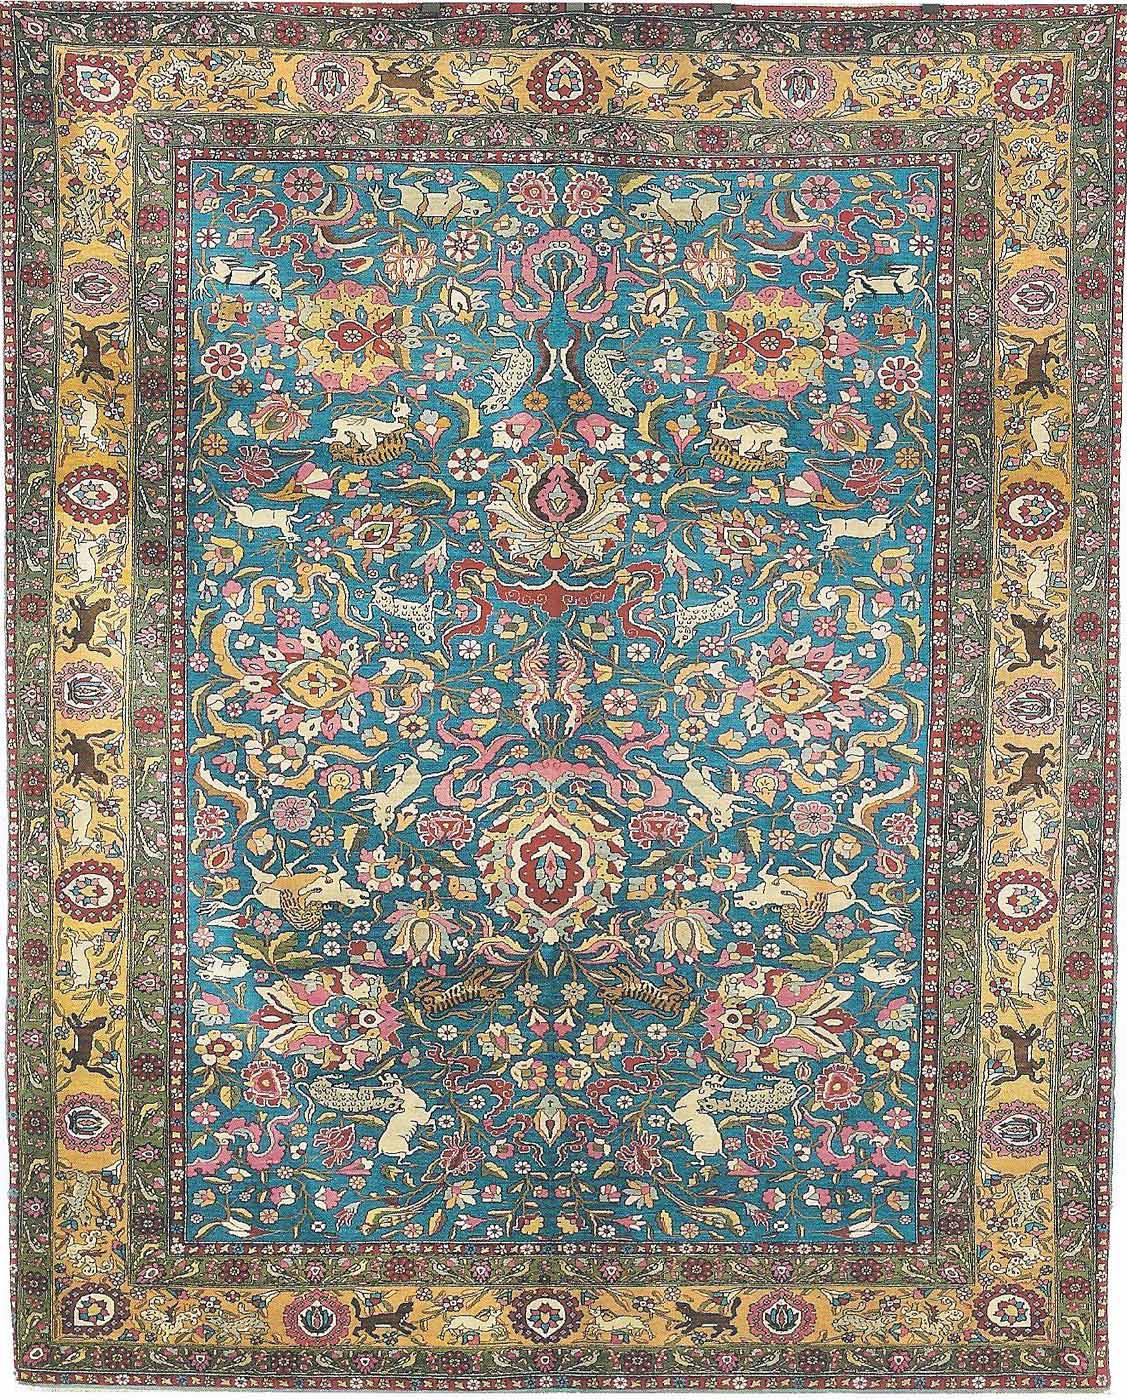 Persian Rugs price Guide